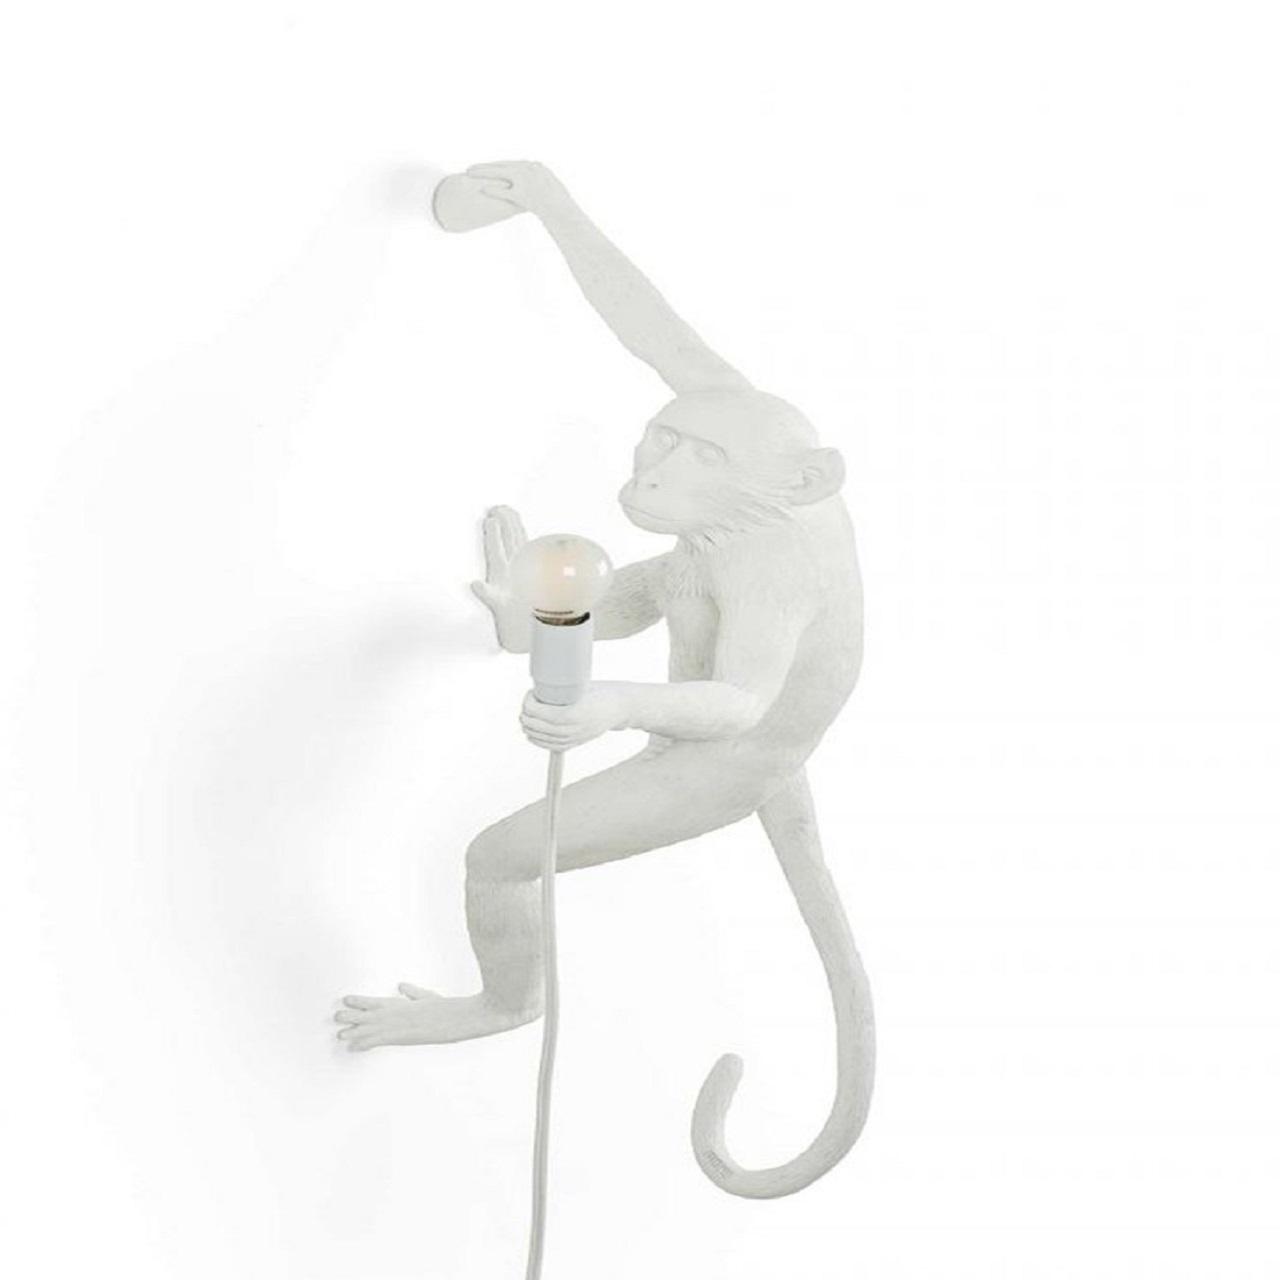 Monkey Lamp pendurado esquerda | Branco